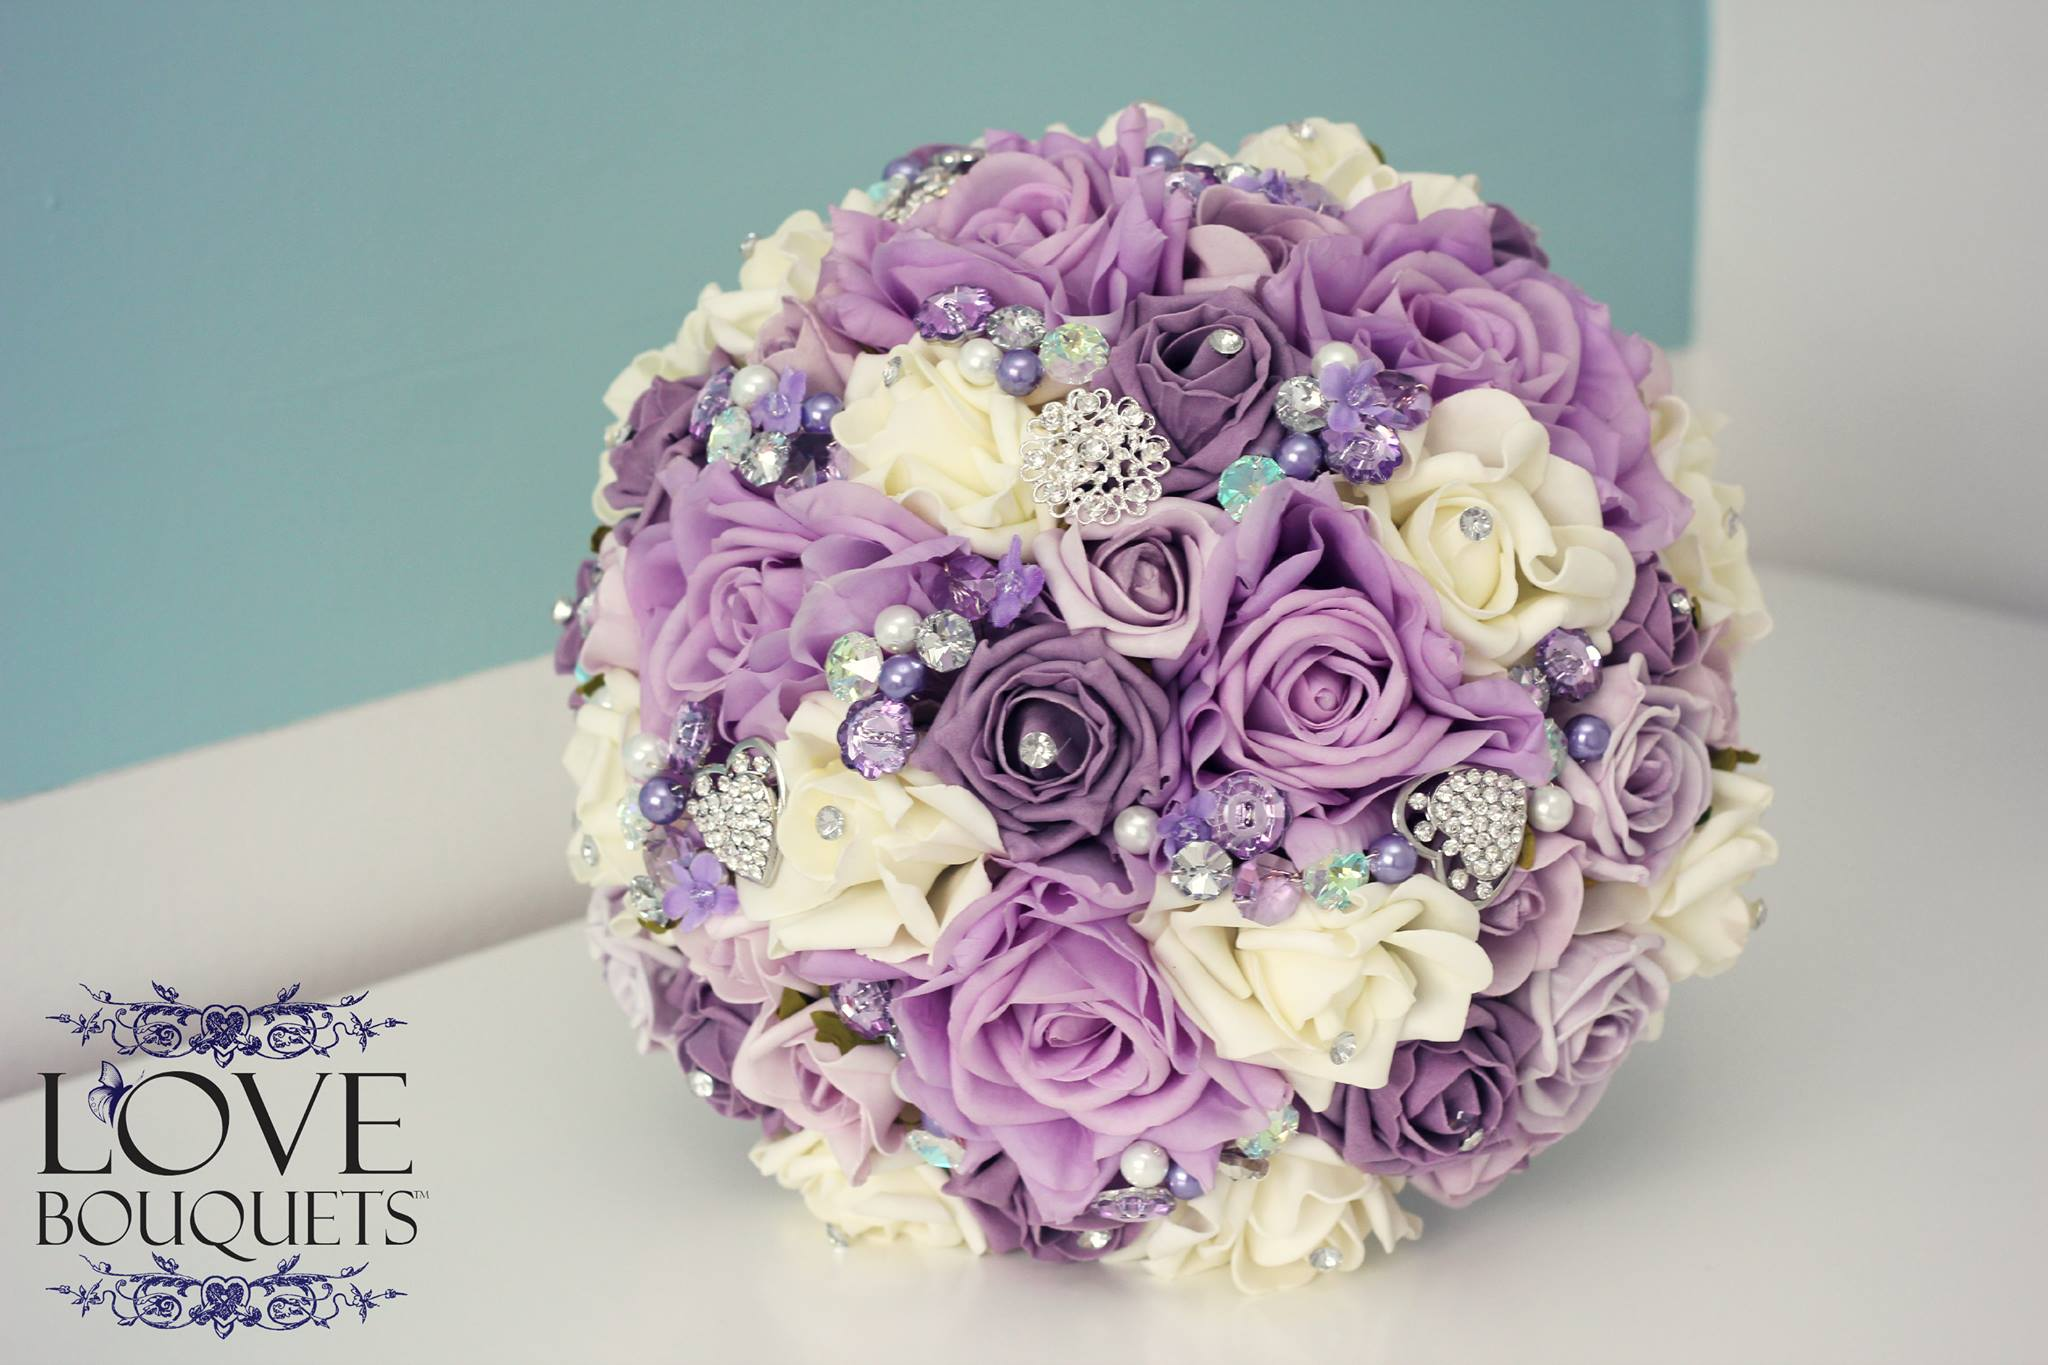 lilac and cream floral bridal bouquet love bouquets. Black Bedroom Furniture Sets. Home Design Ideas